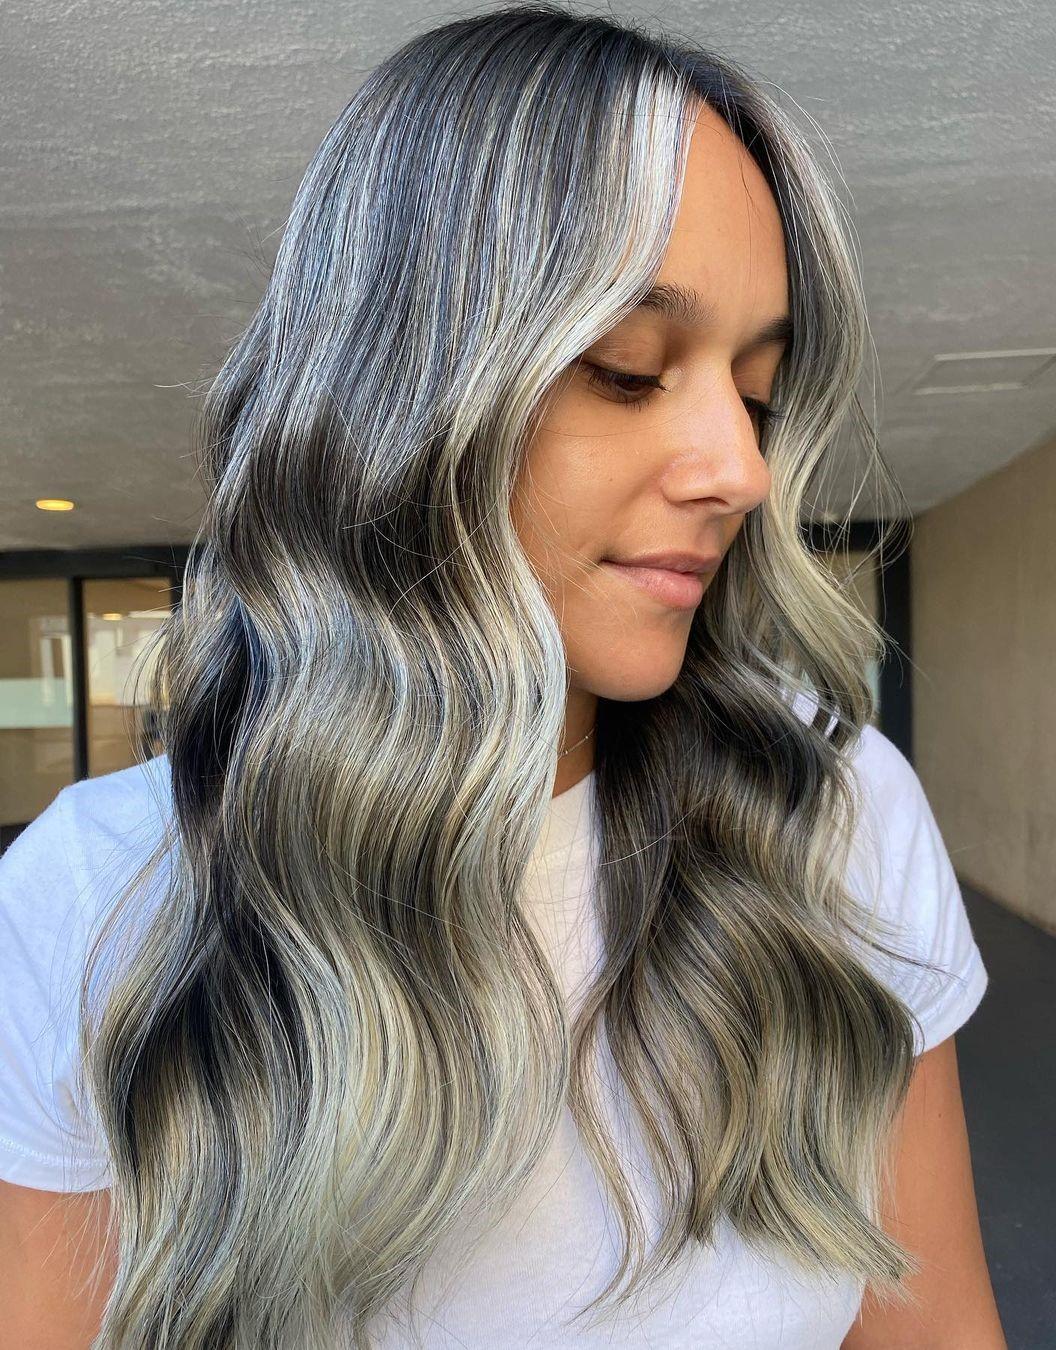 White Highlights on Dark Hair